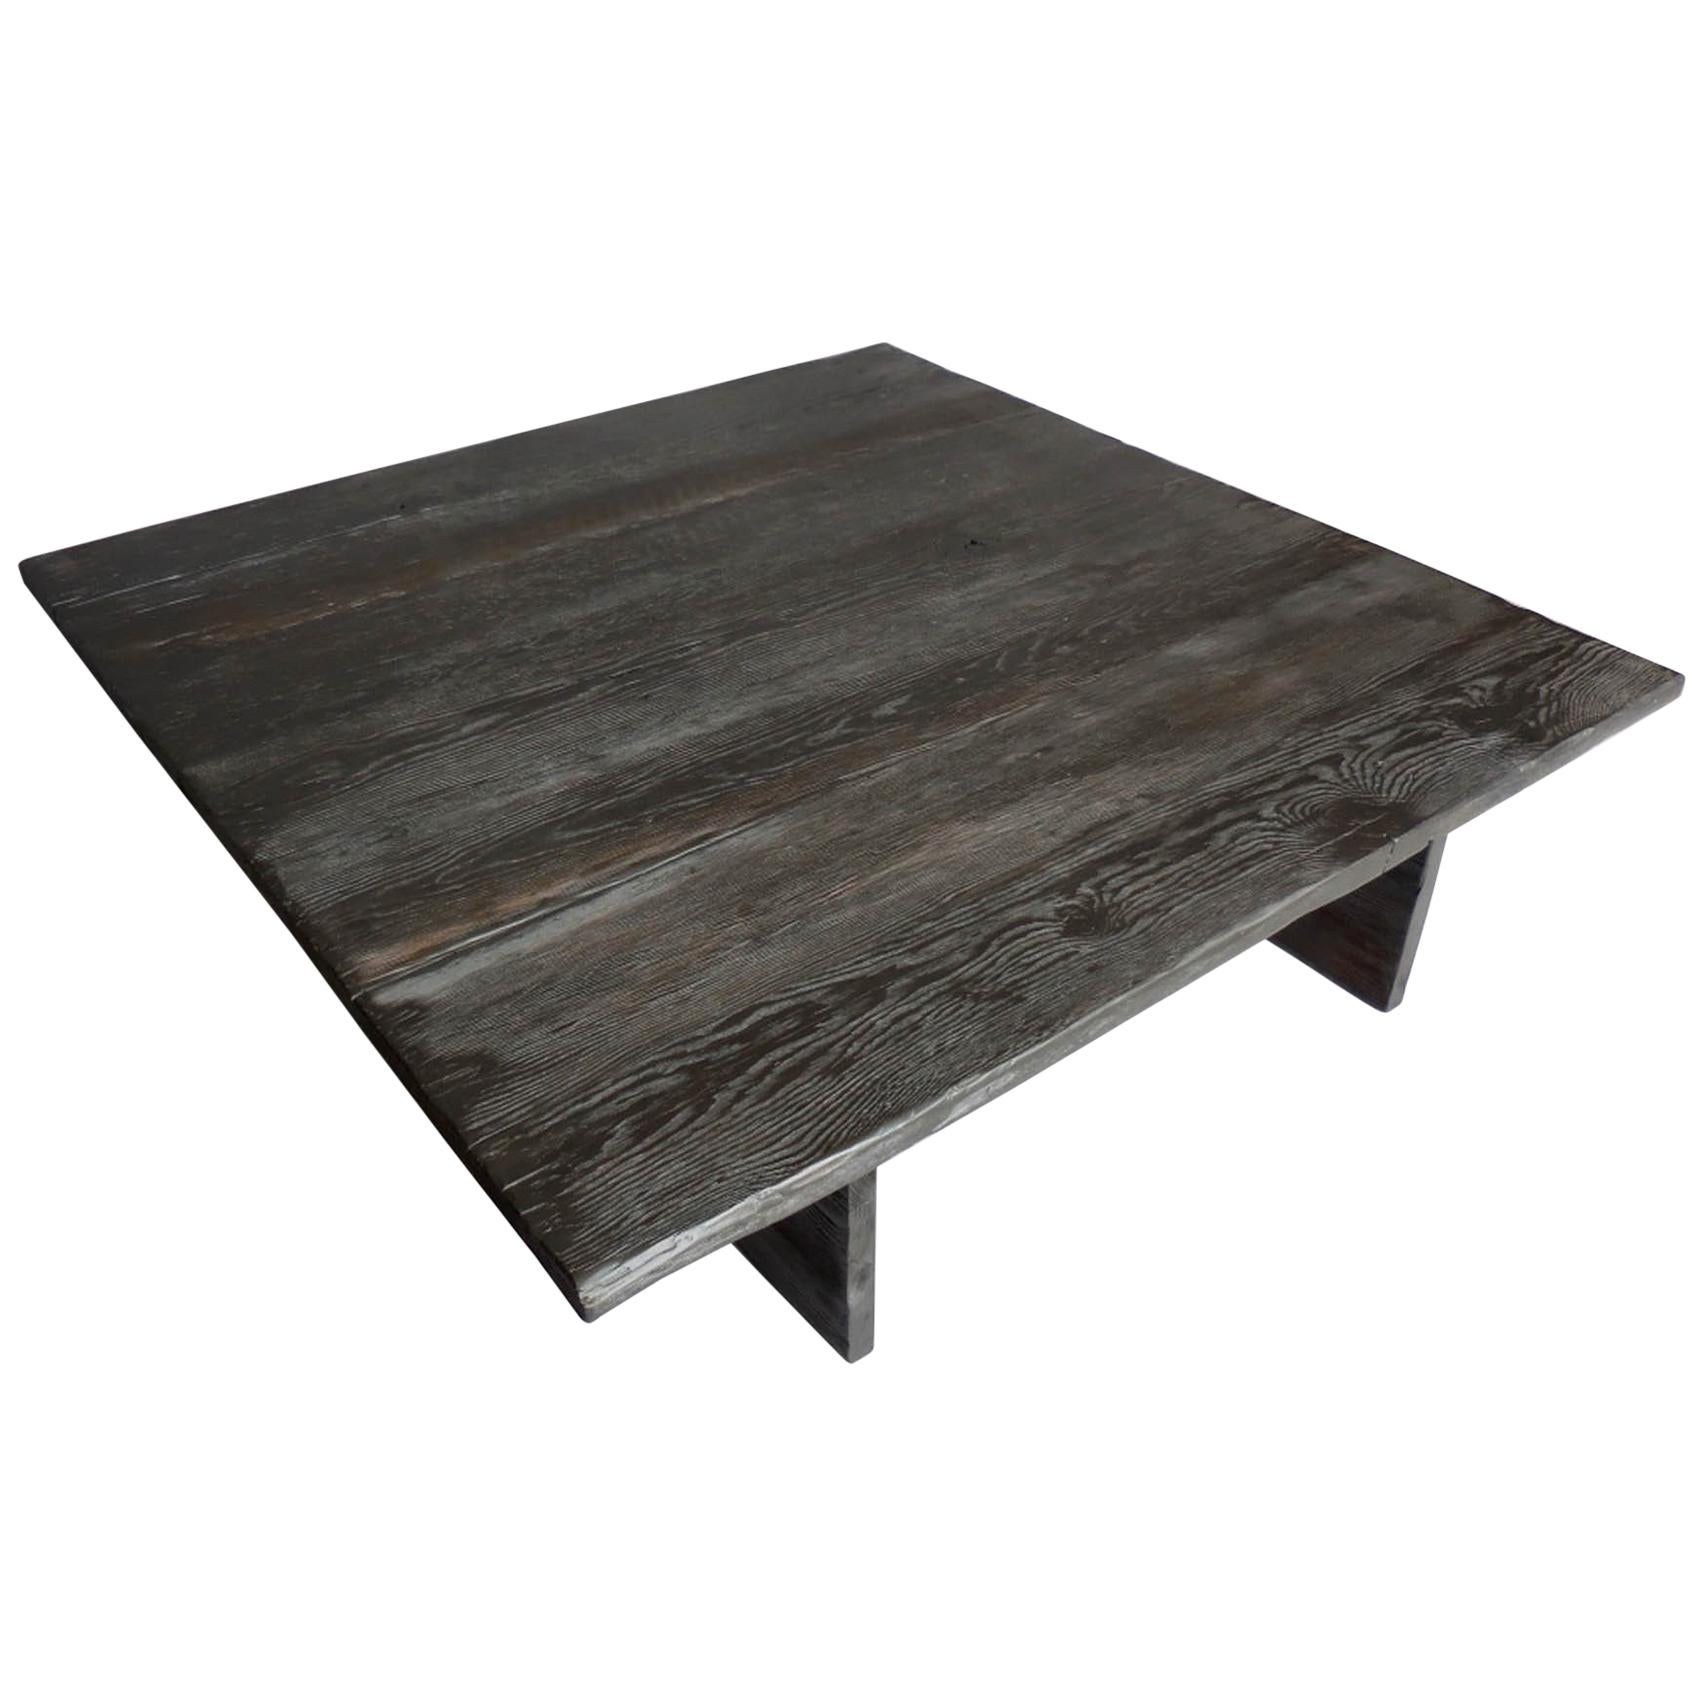 Custom Rustic Modern Coffee Table